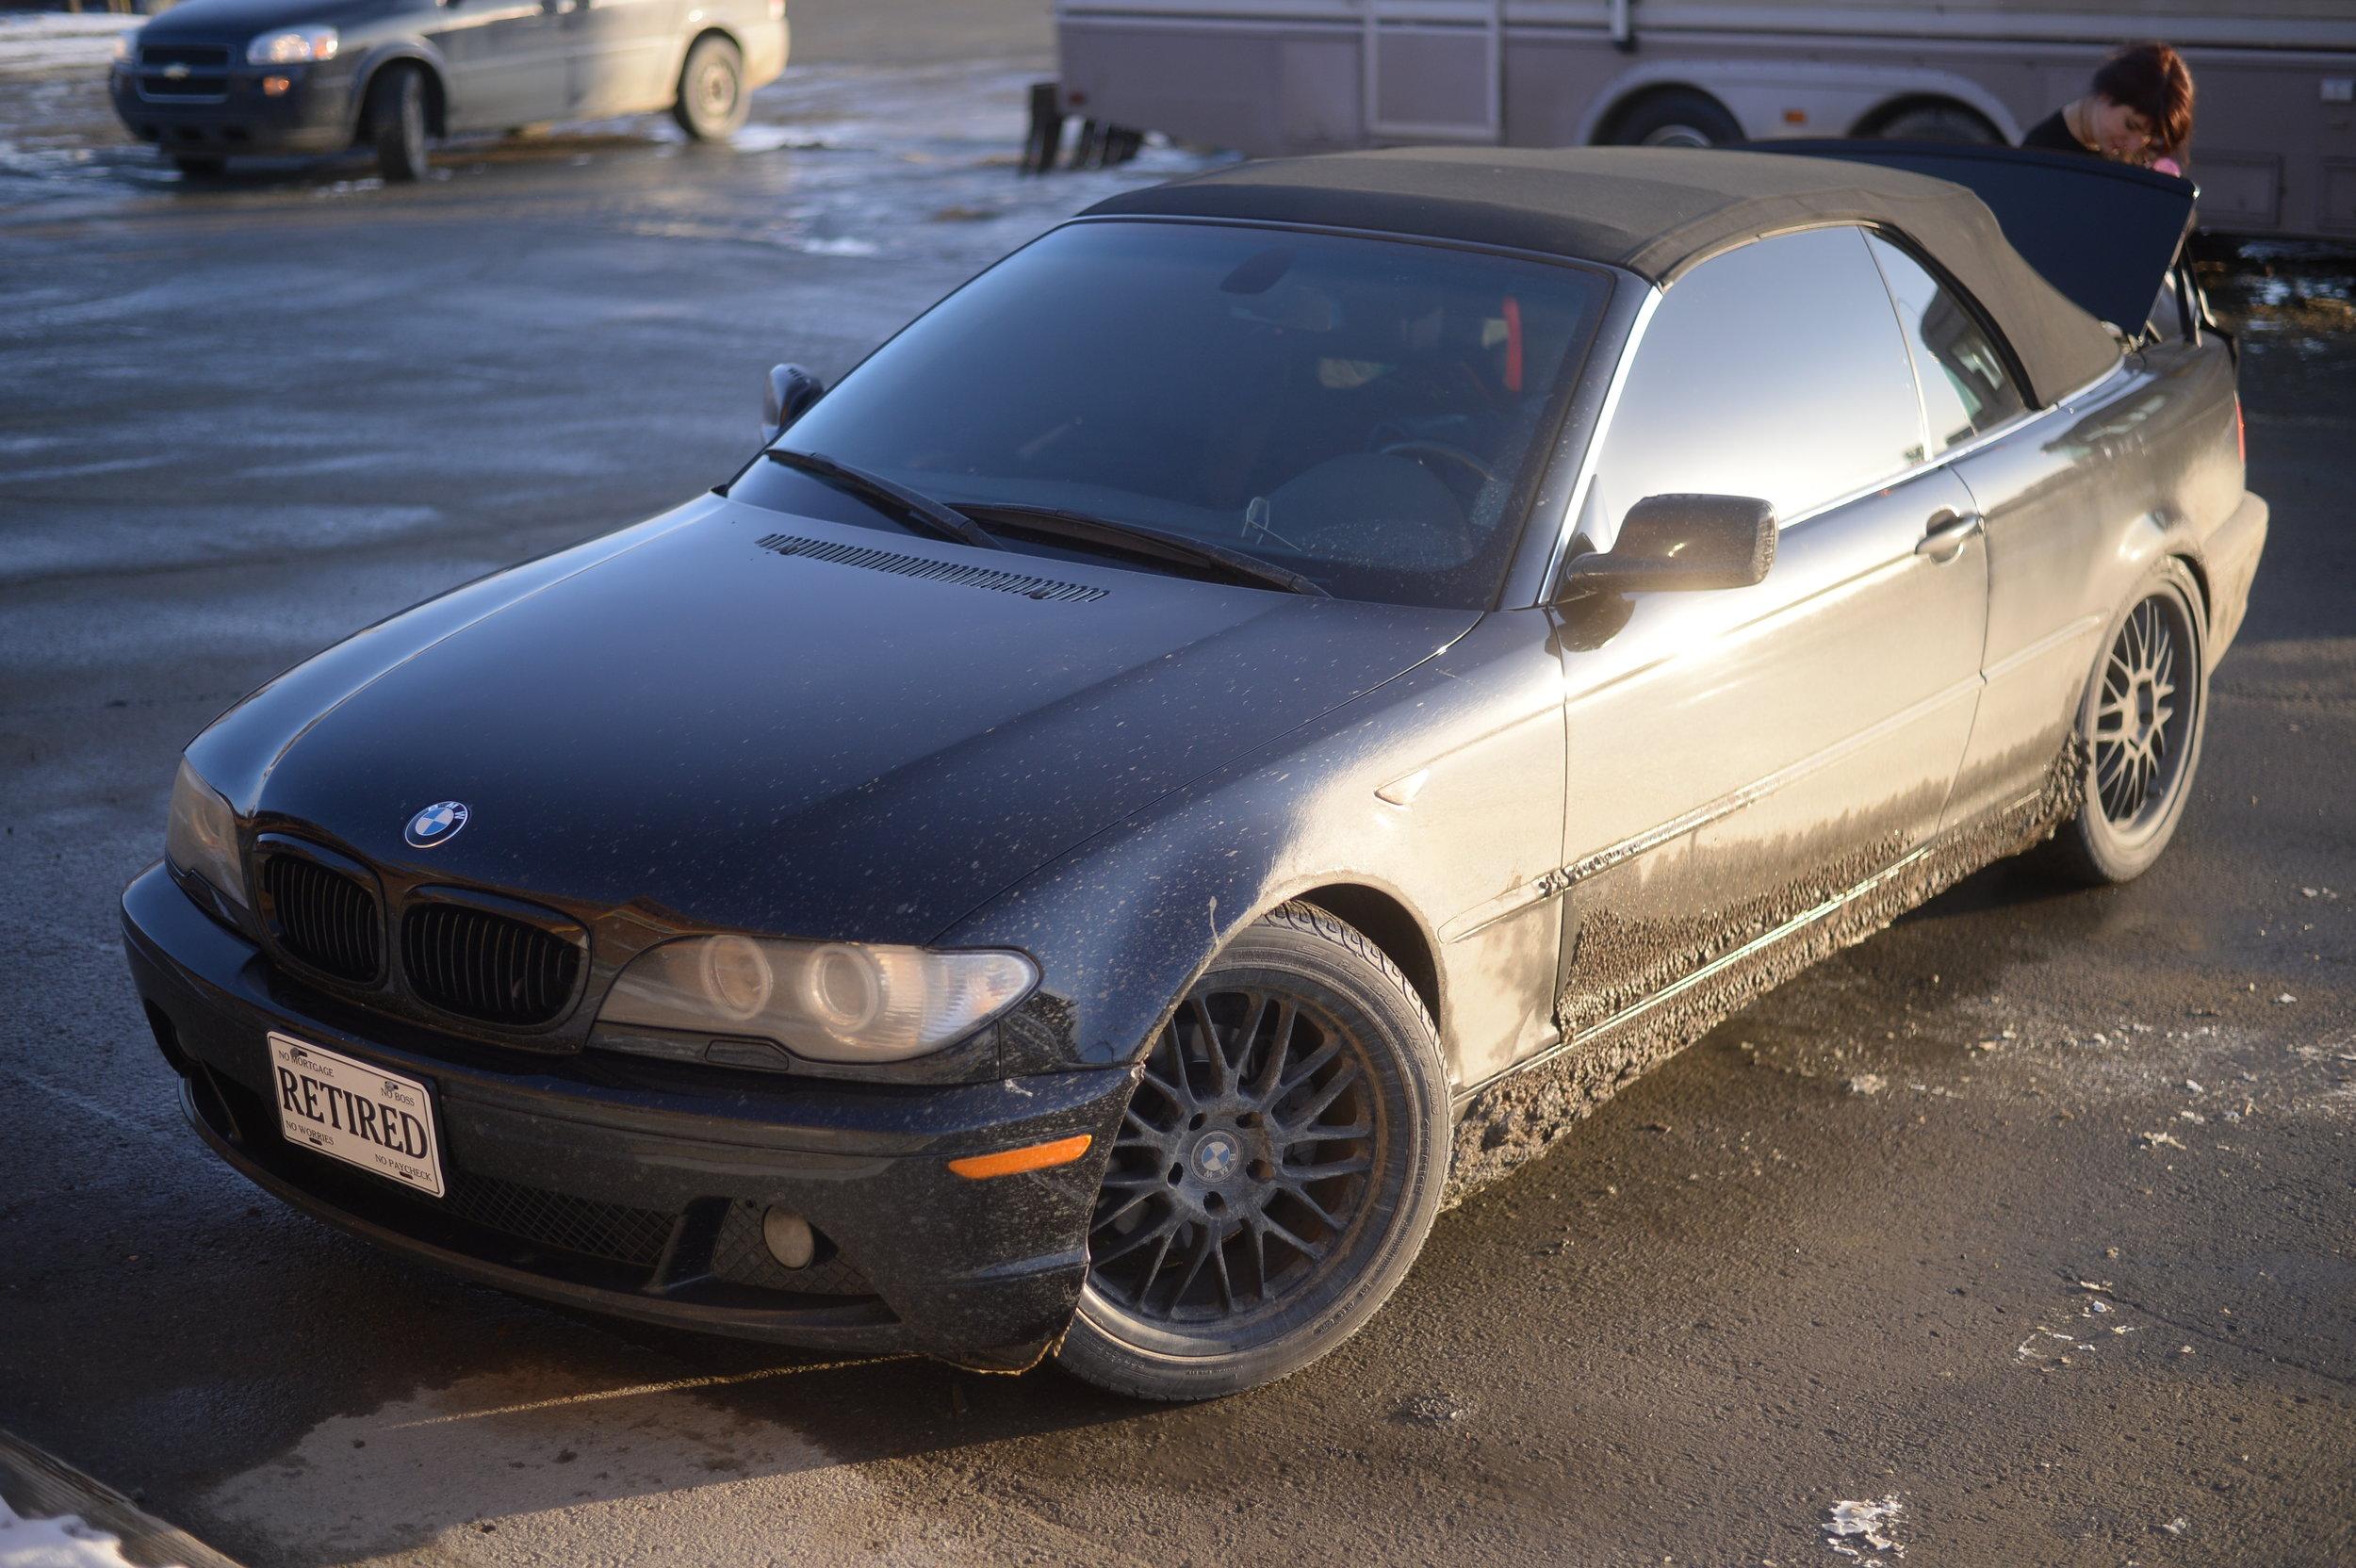 Day six: The car needs a car wash ASAP.